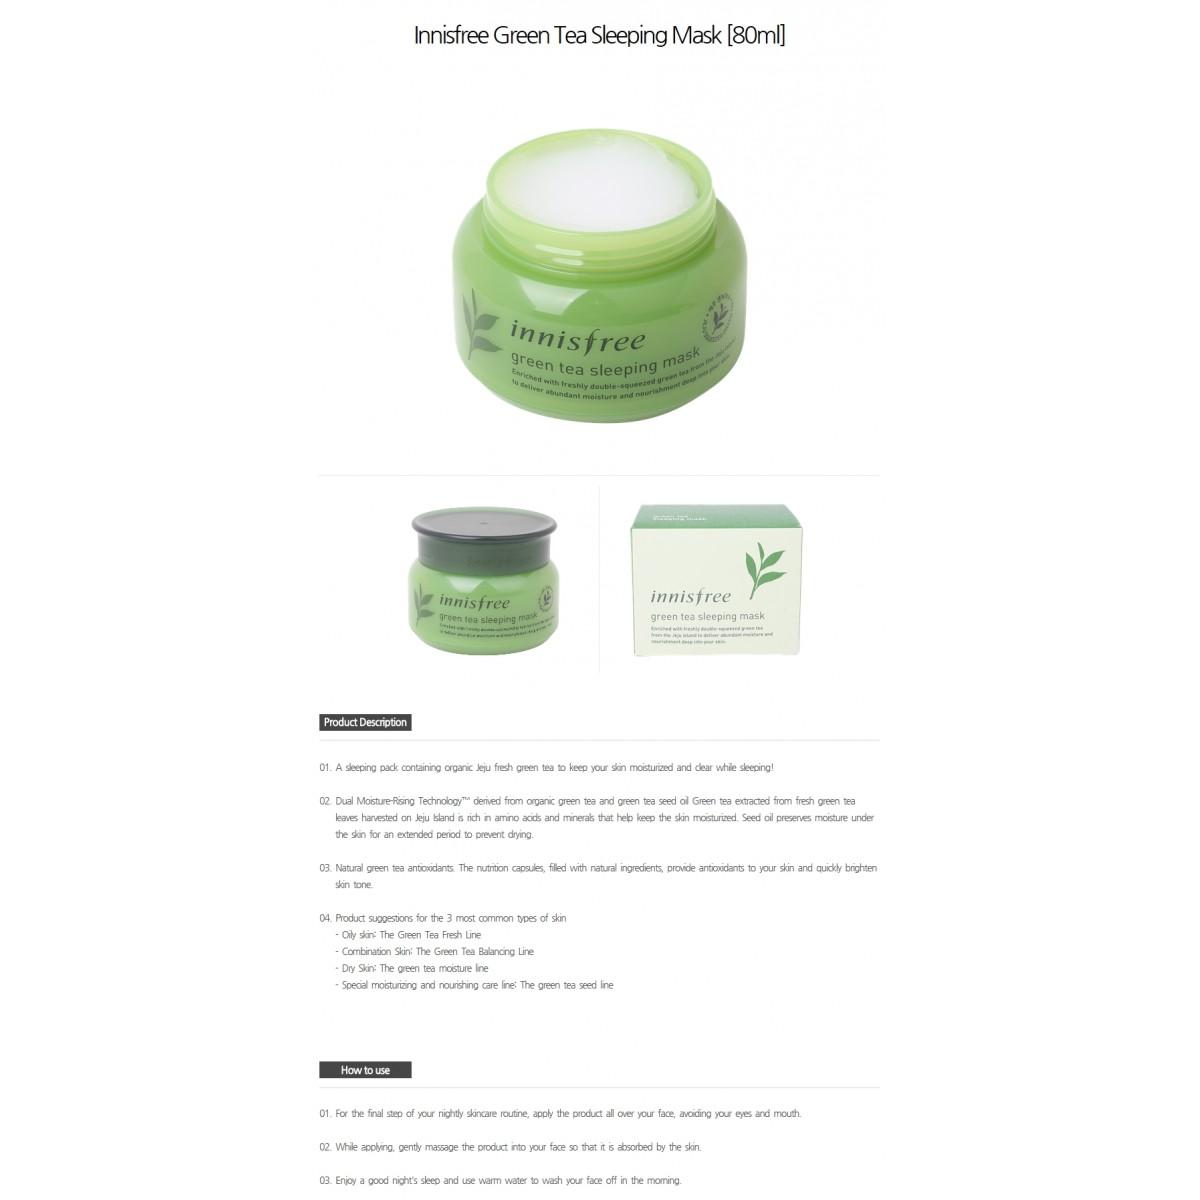 Innisfree Green Tea Sleeping Pack Mask